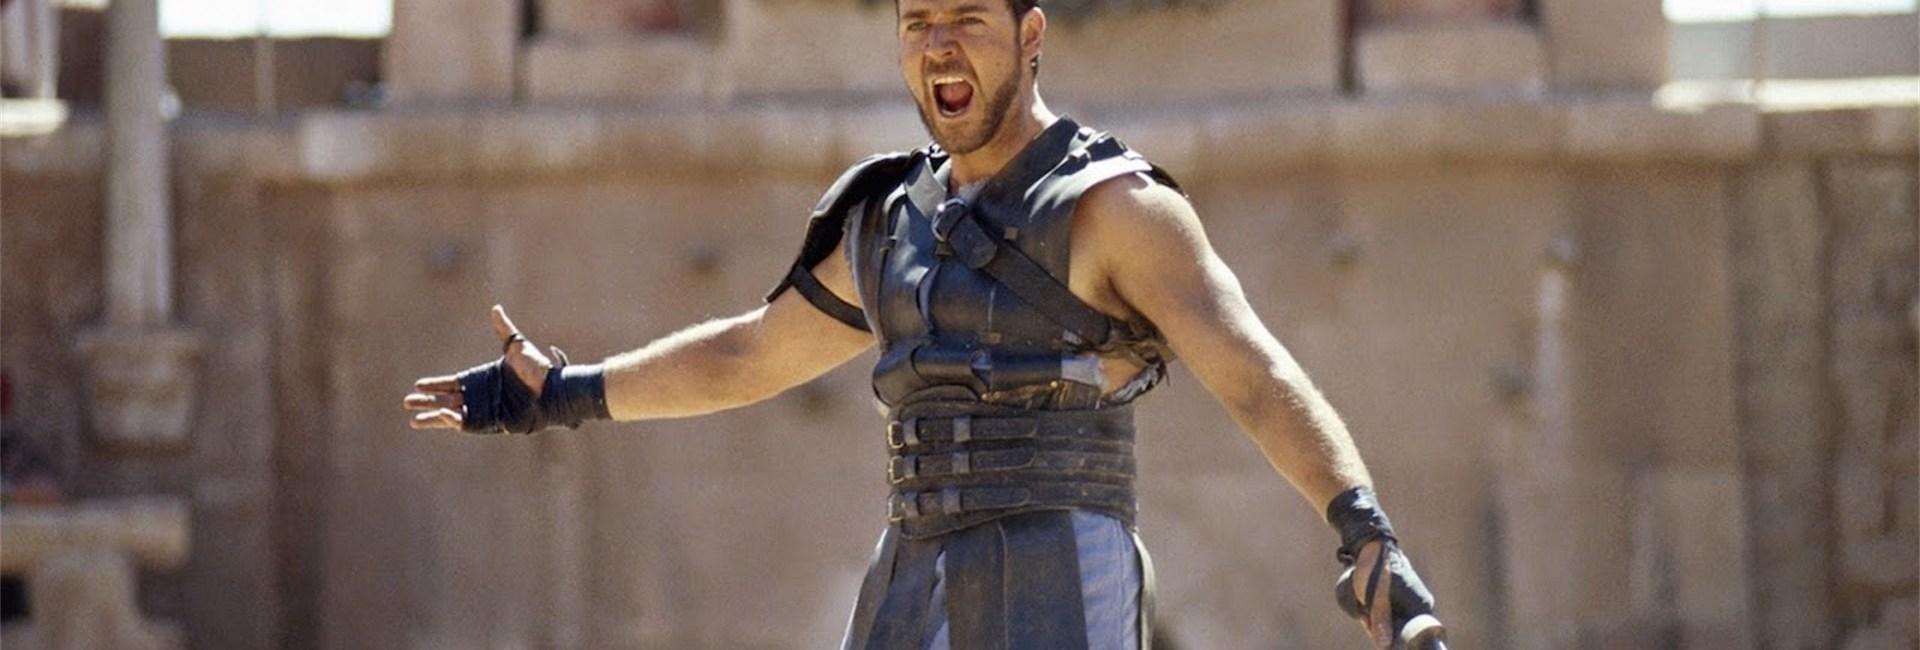 gladiator-2-